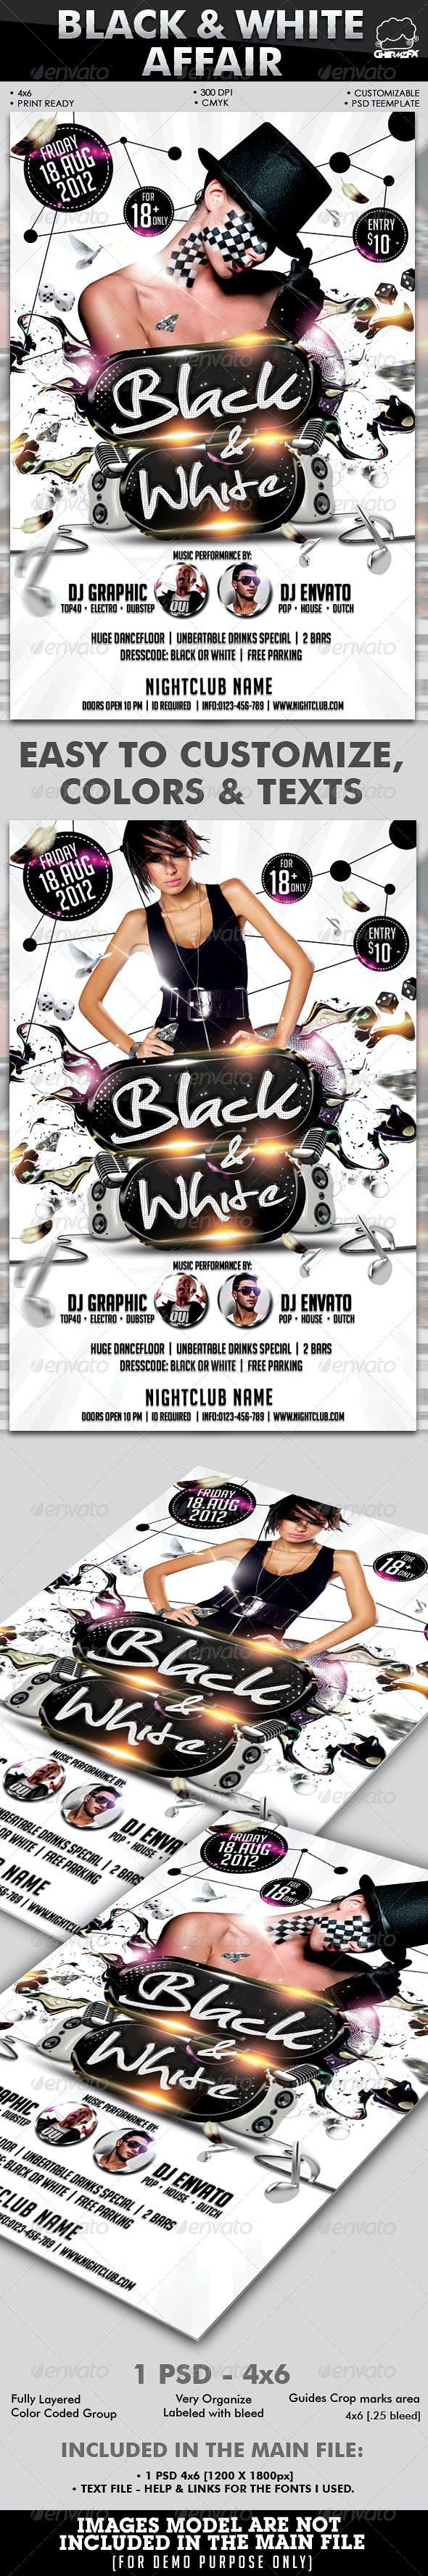 black white affair flyer template by hermz graphicriver